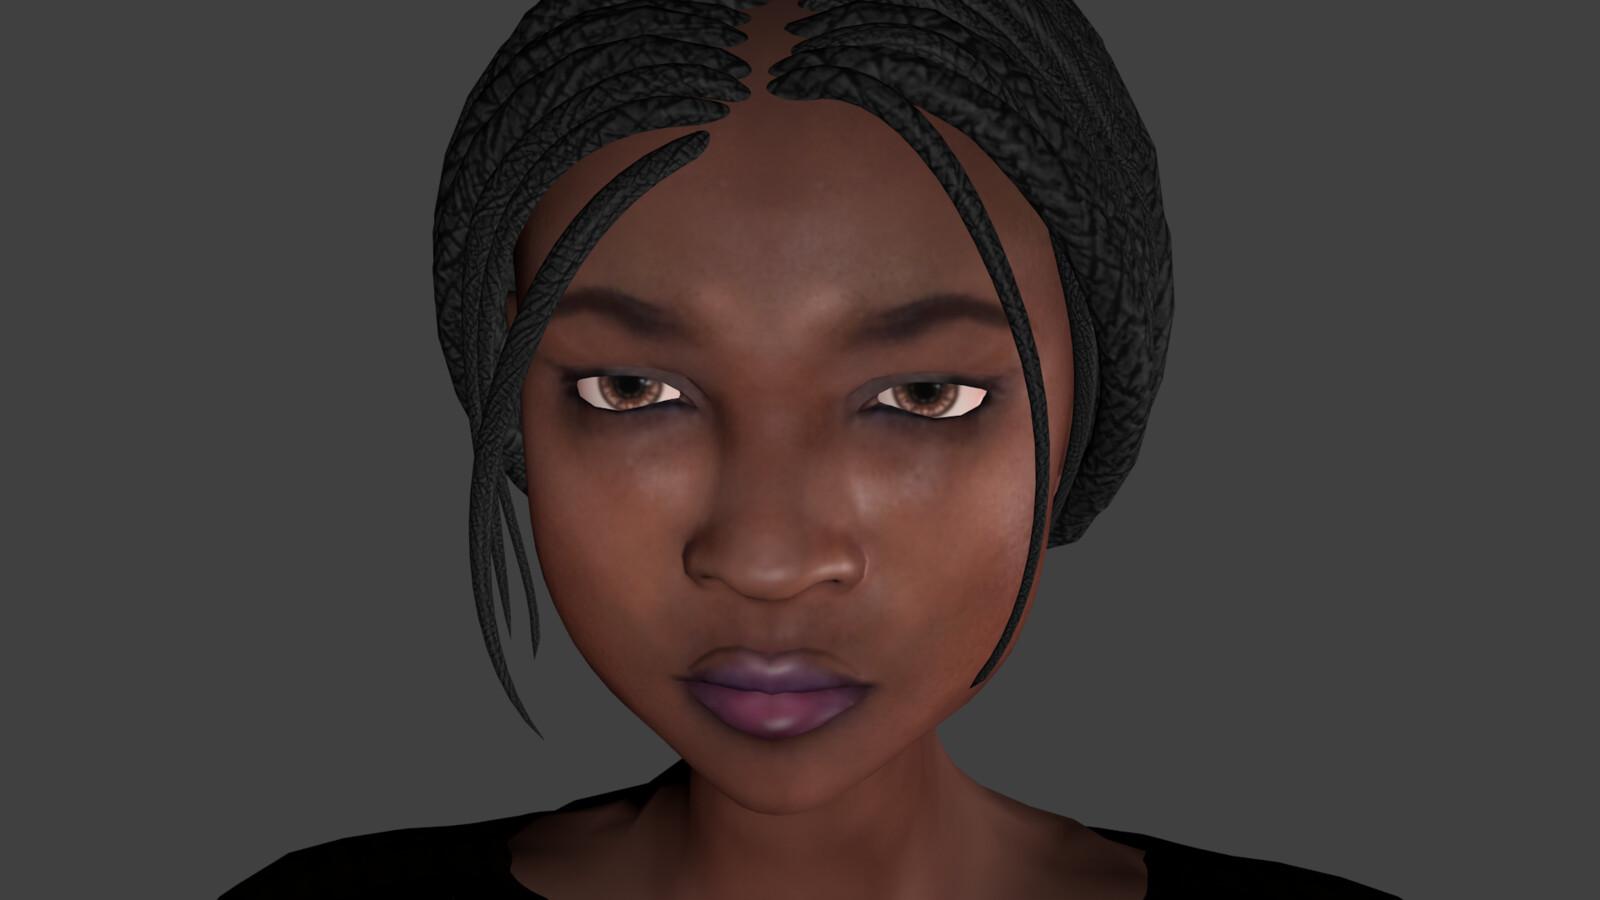 Meet Eve, the main protagonist